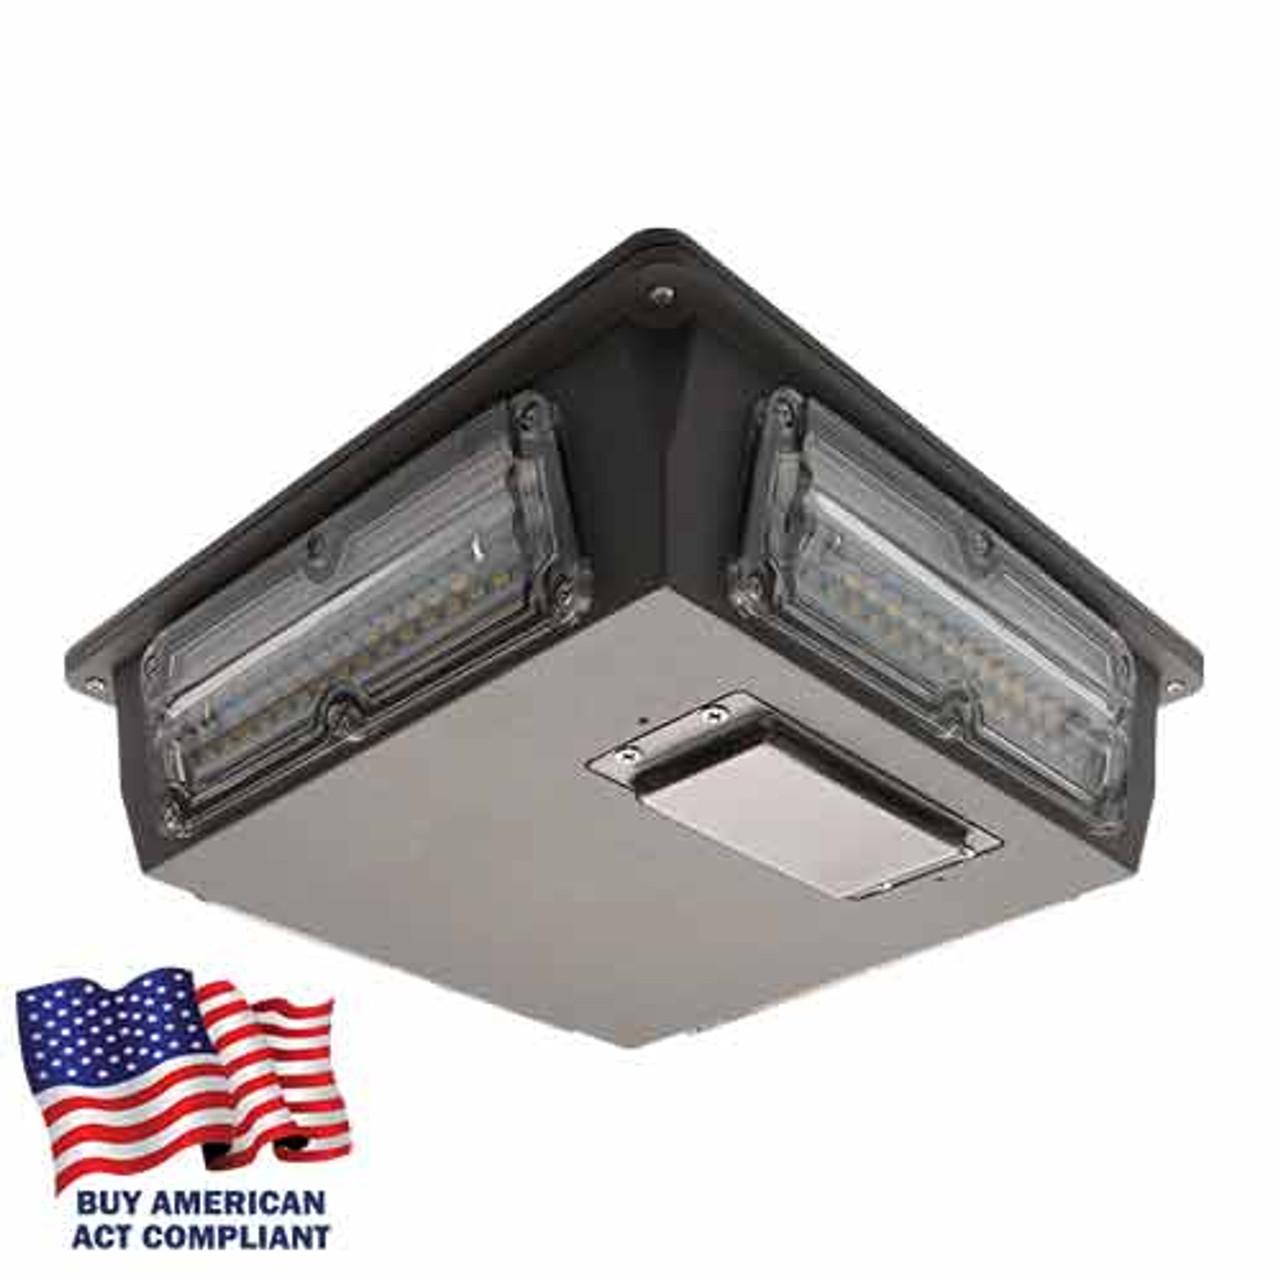 60 Watt LED Parking Garage Light Buy America Act